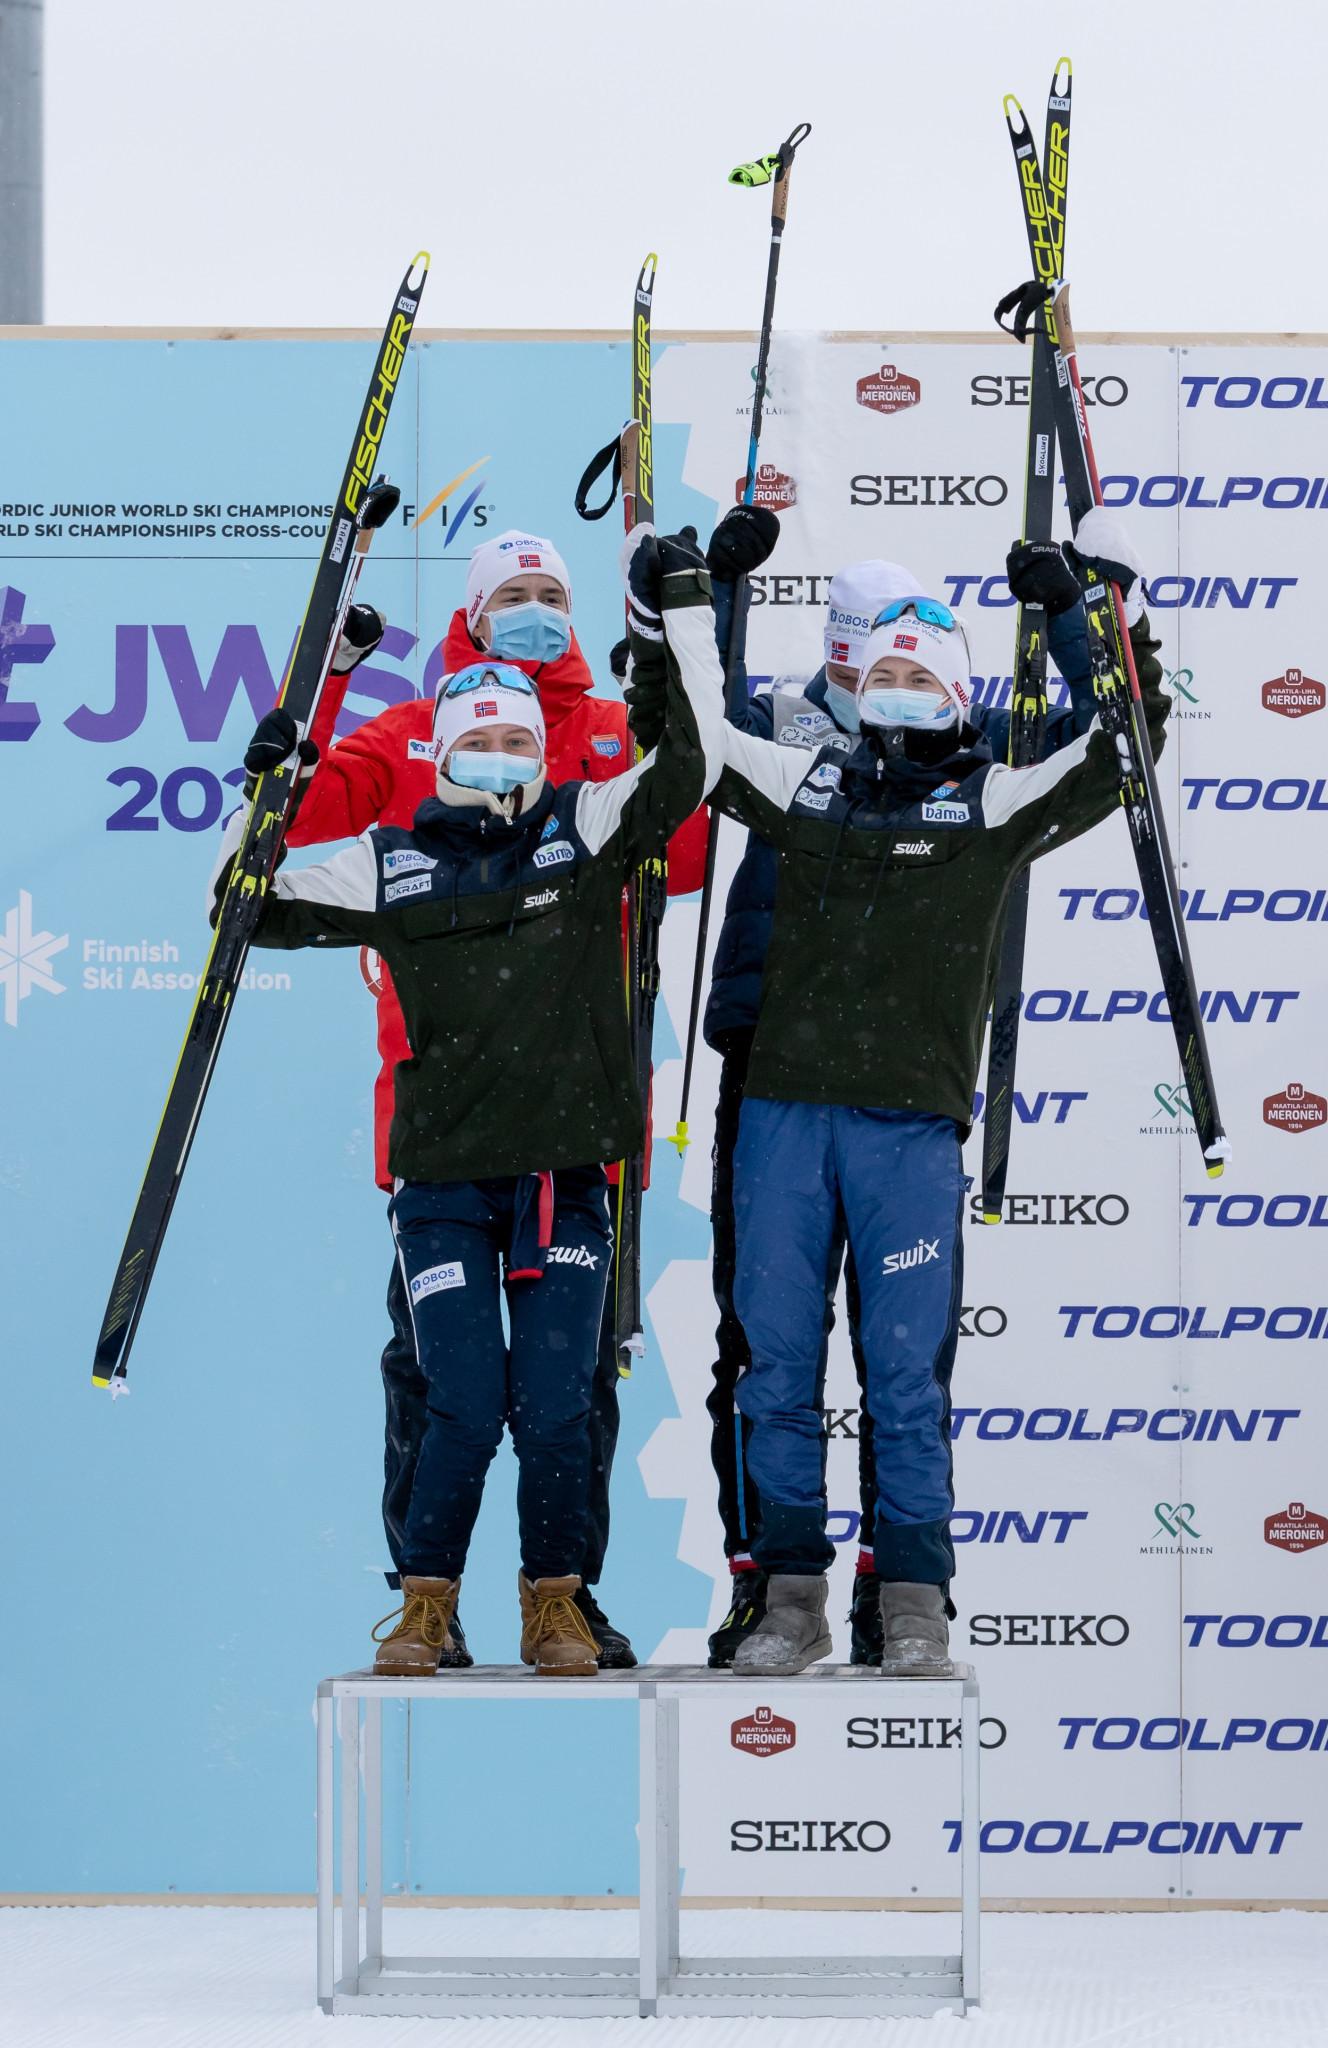 Norway retains mixed team title at Nordic Junior World Ski Championships